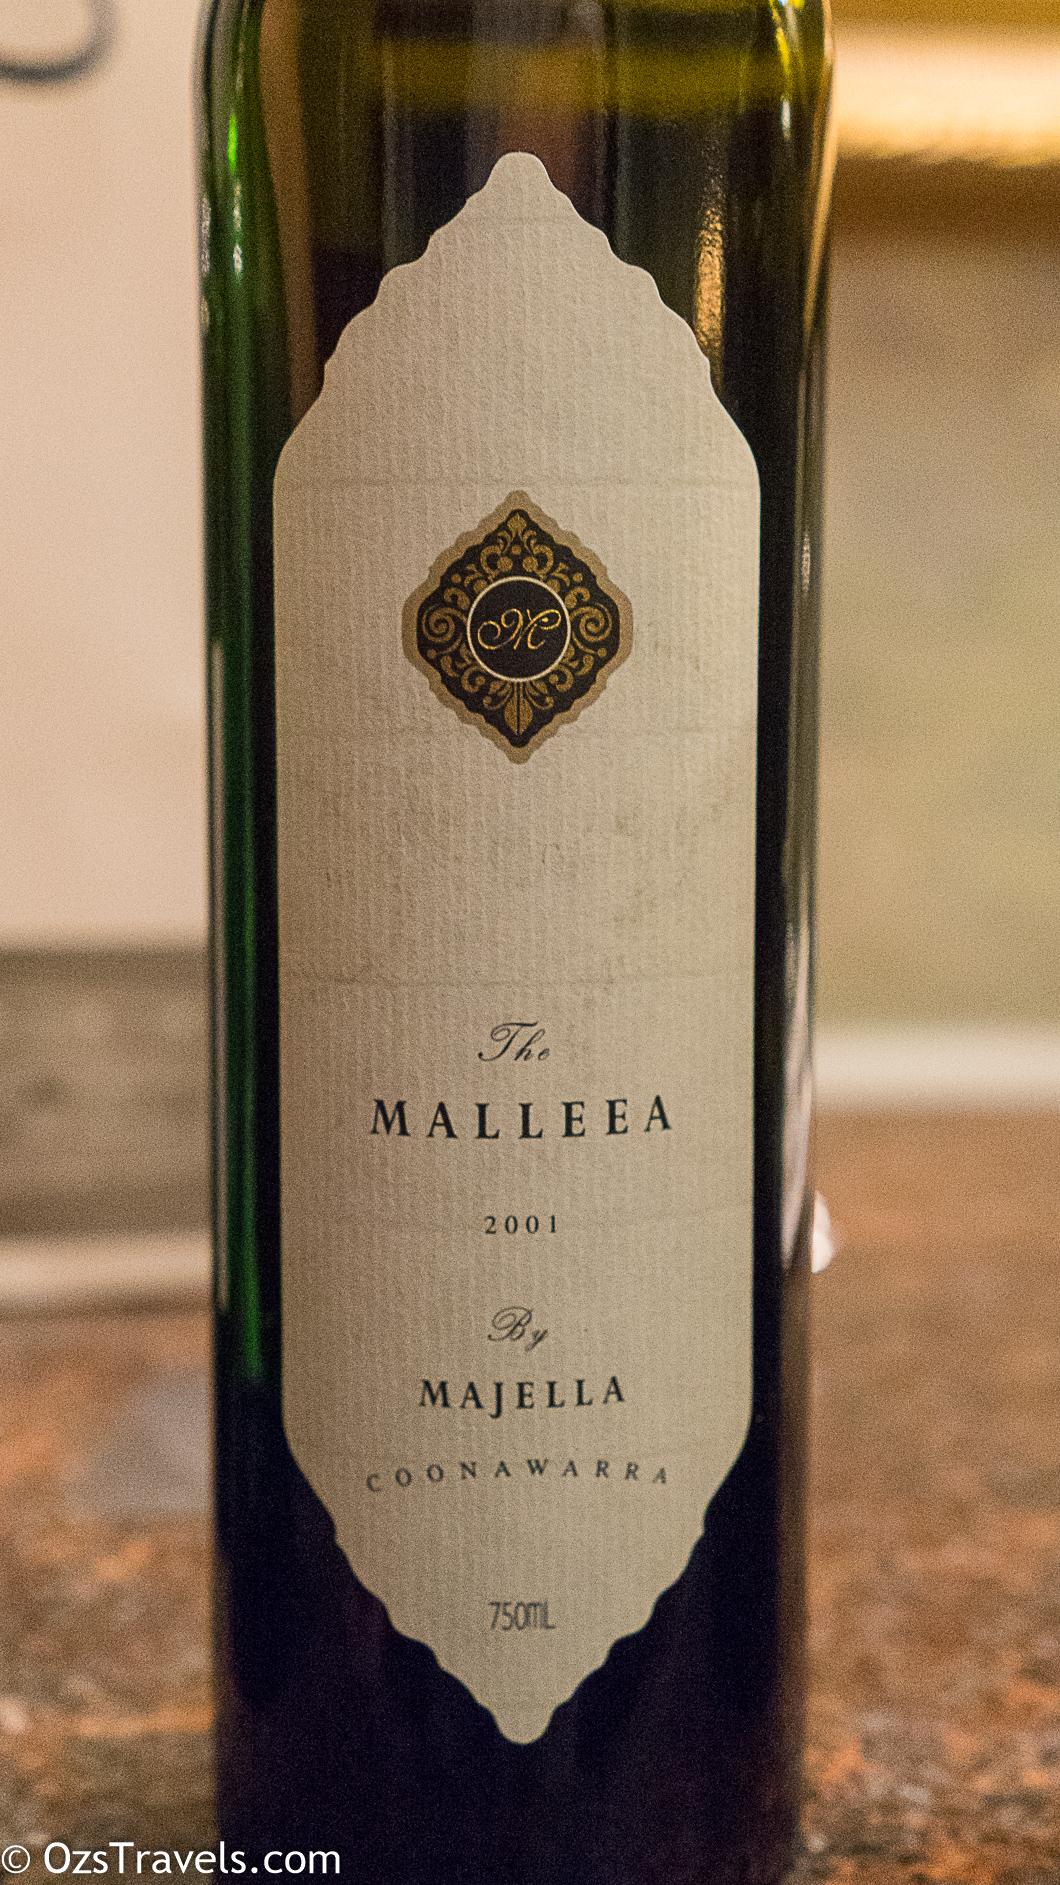 Singapore Brown Bag, 2017 March Wine Reviews, Majella The Malleea